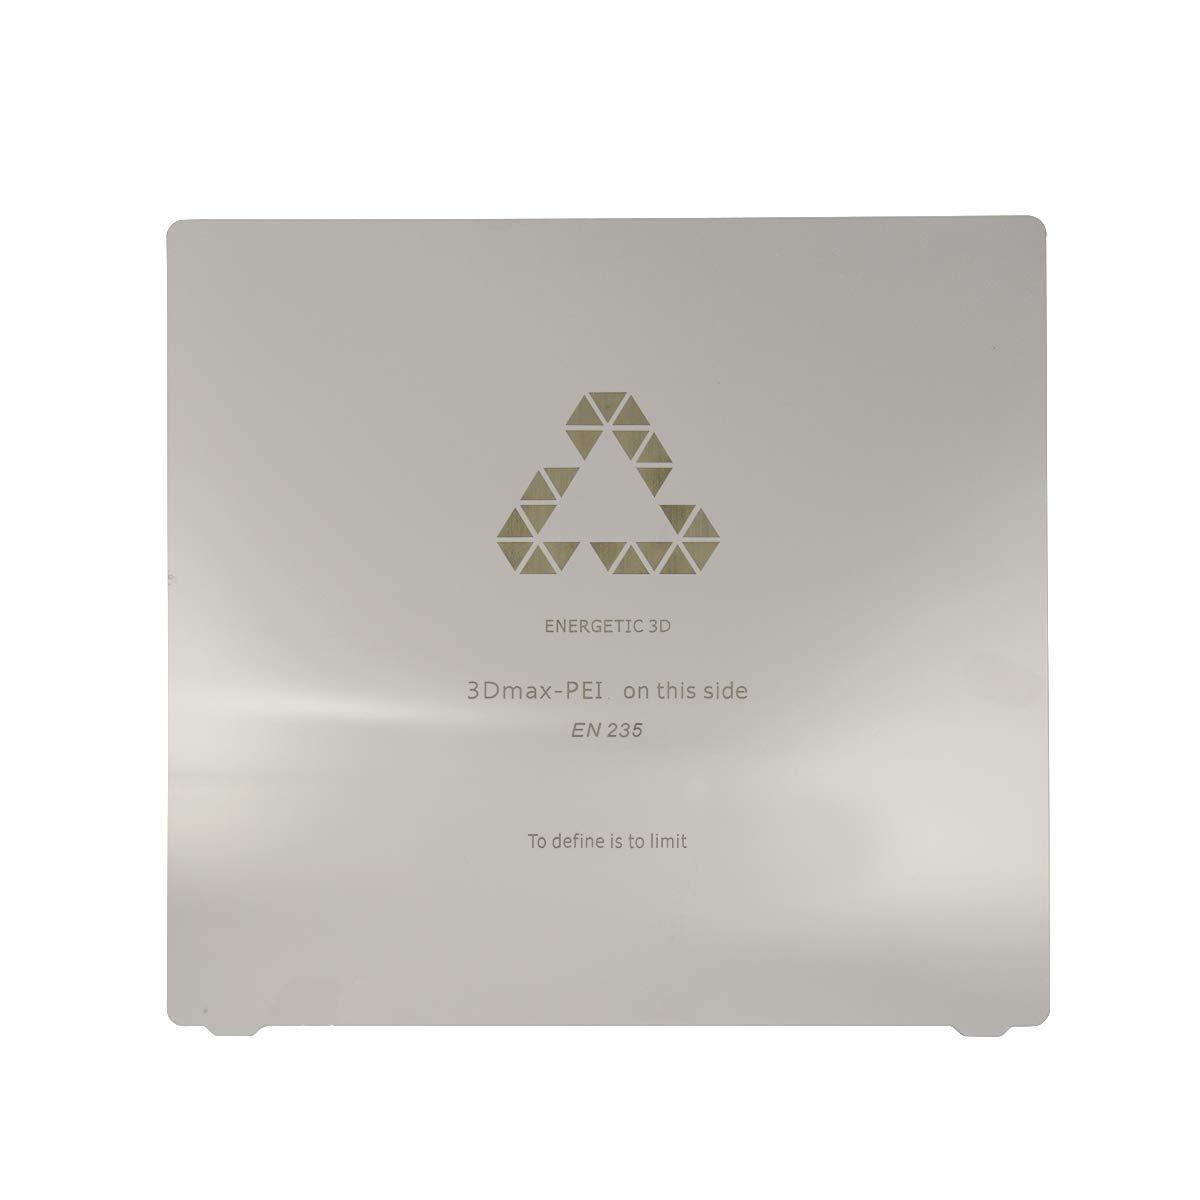 Wisamic - Placa magnética para impresora 3D (PEI, 220 x 220 mm ...